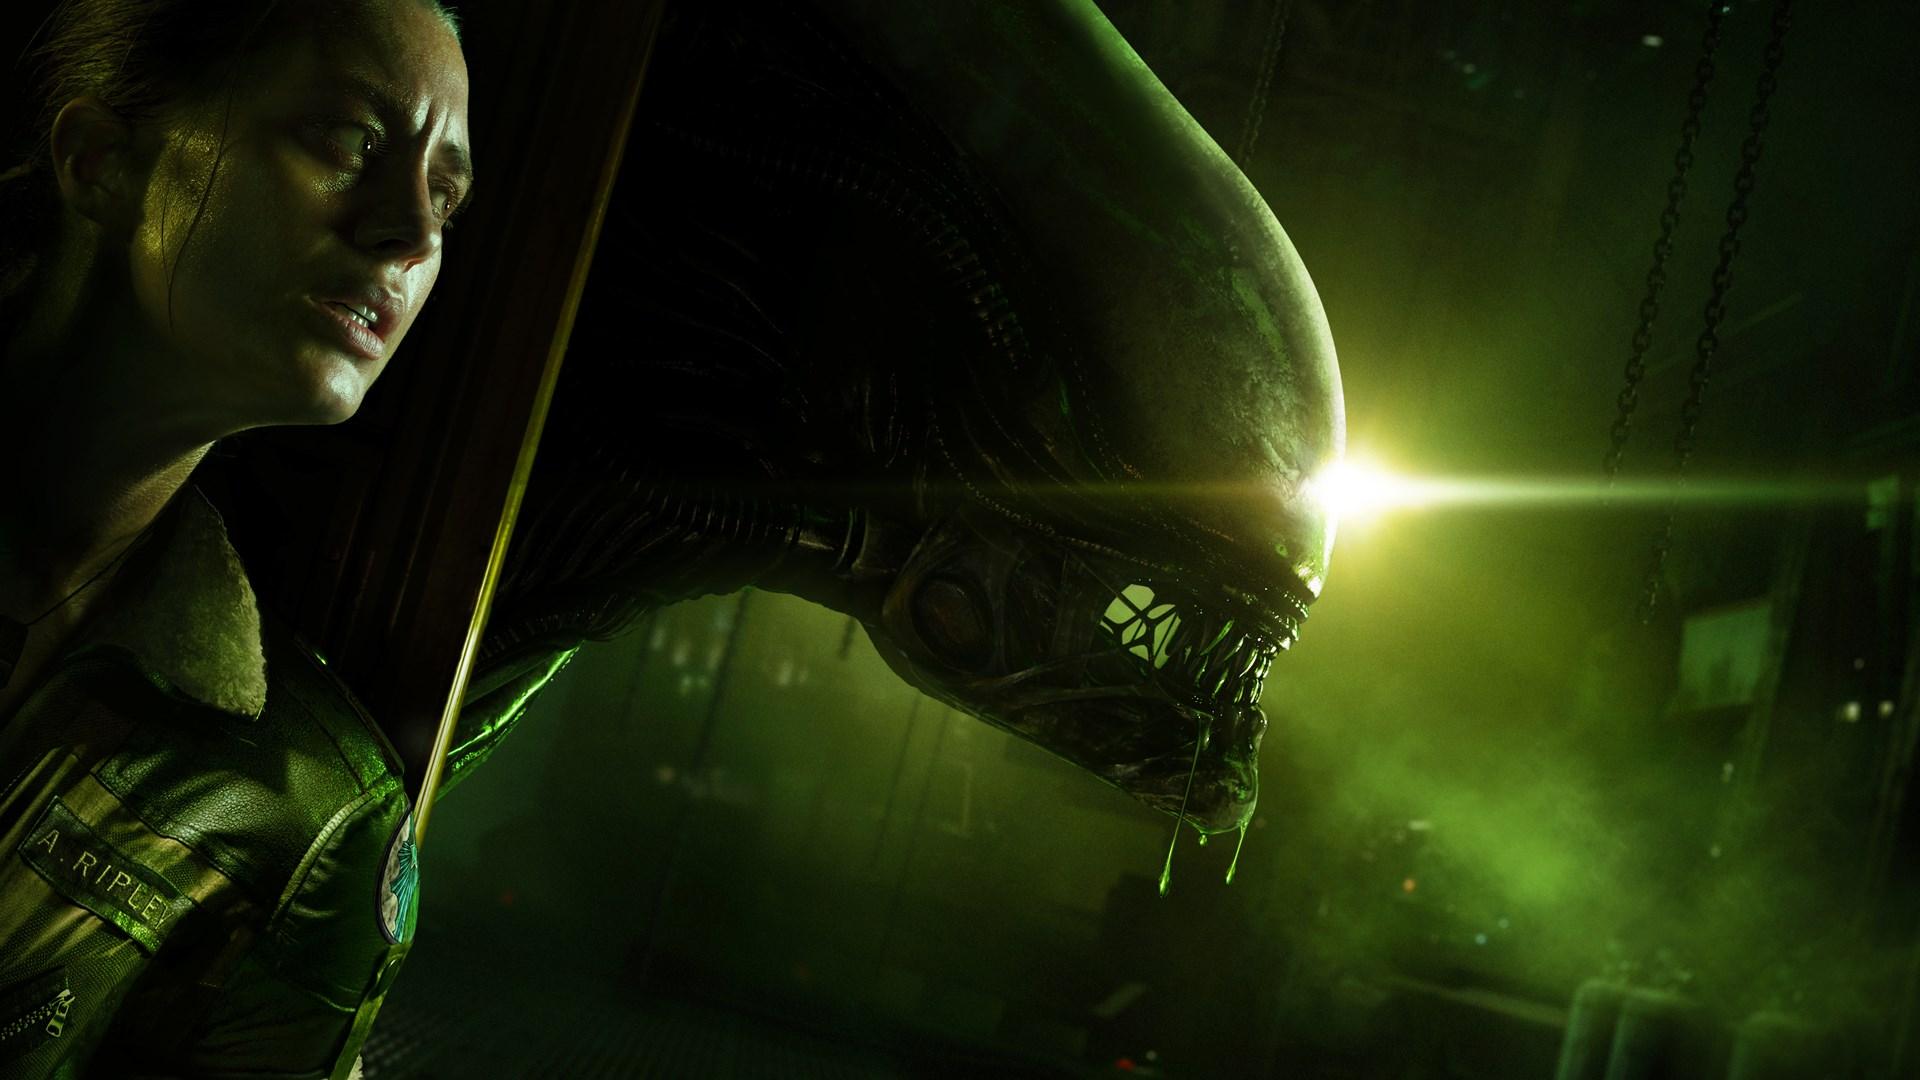 Heti ingyenes – Alien: Isolation és Hand of the Fate 2